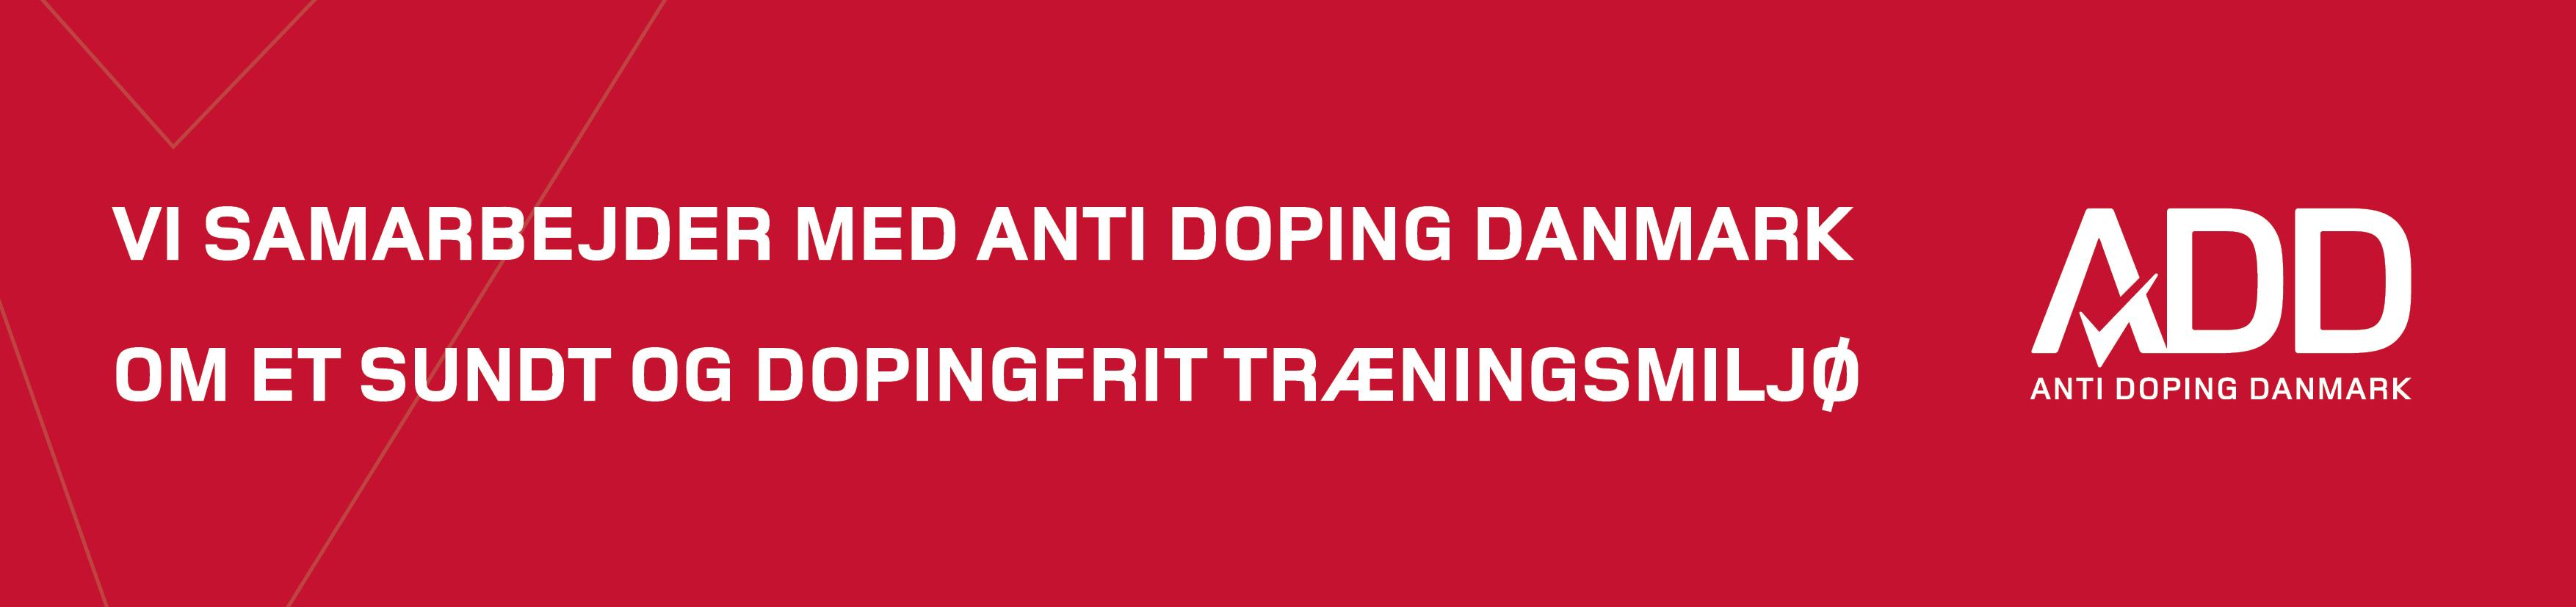 AntidopingDanmark